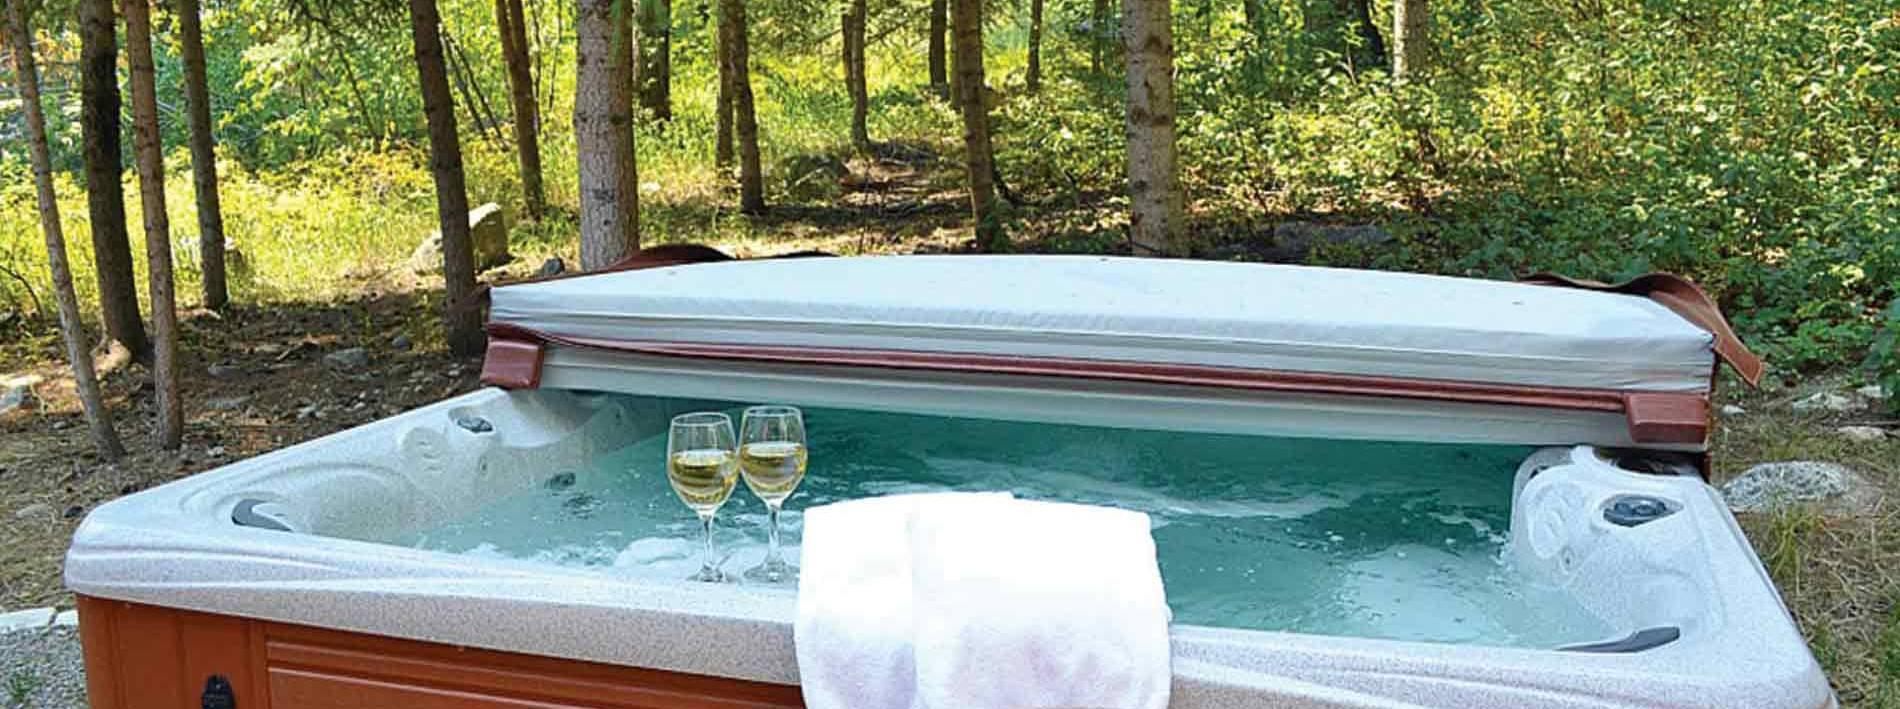 Hot tub at the Blue Moose Lodge in Jackson Hole